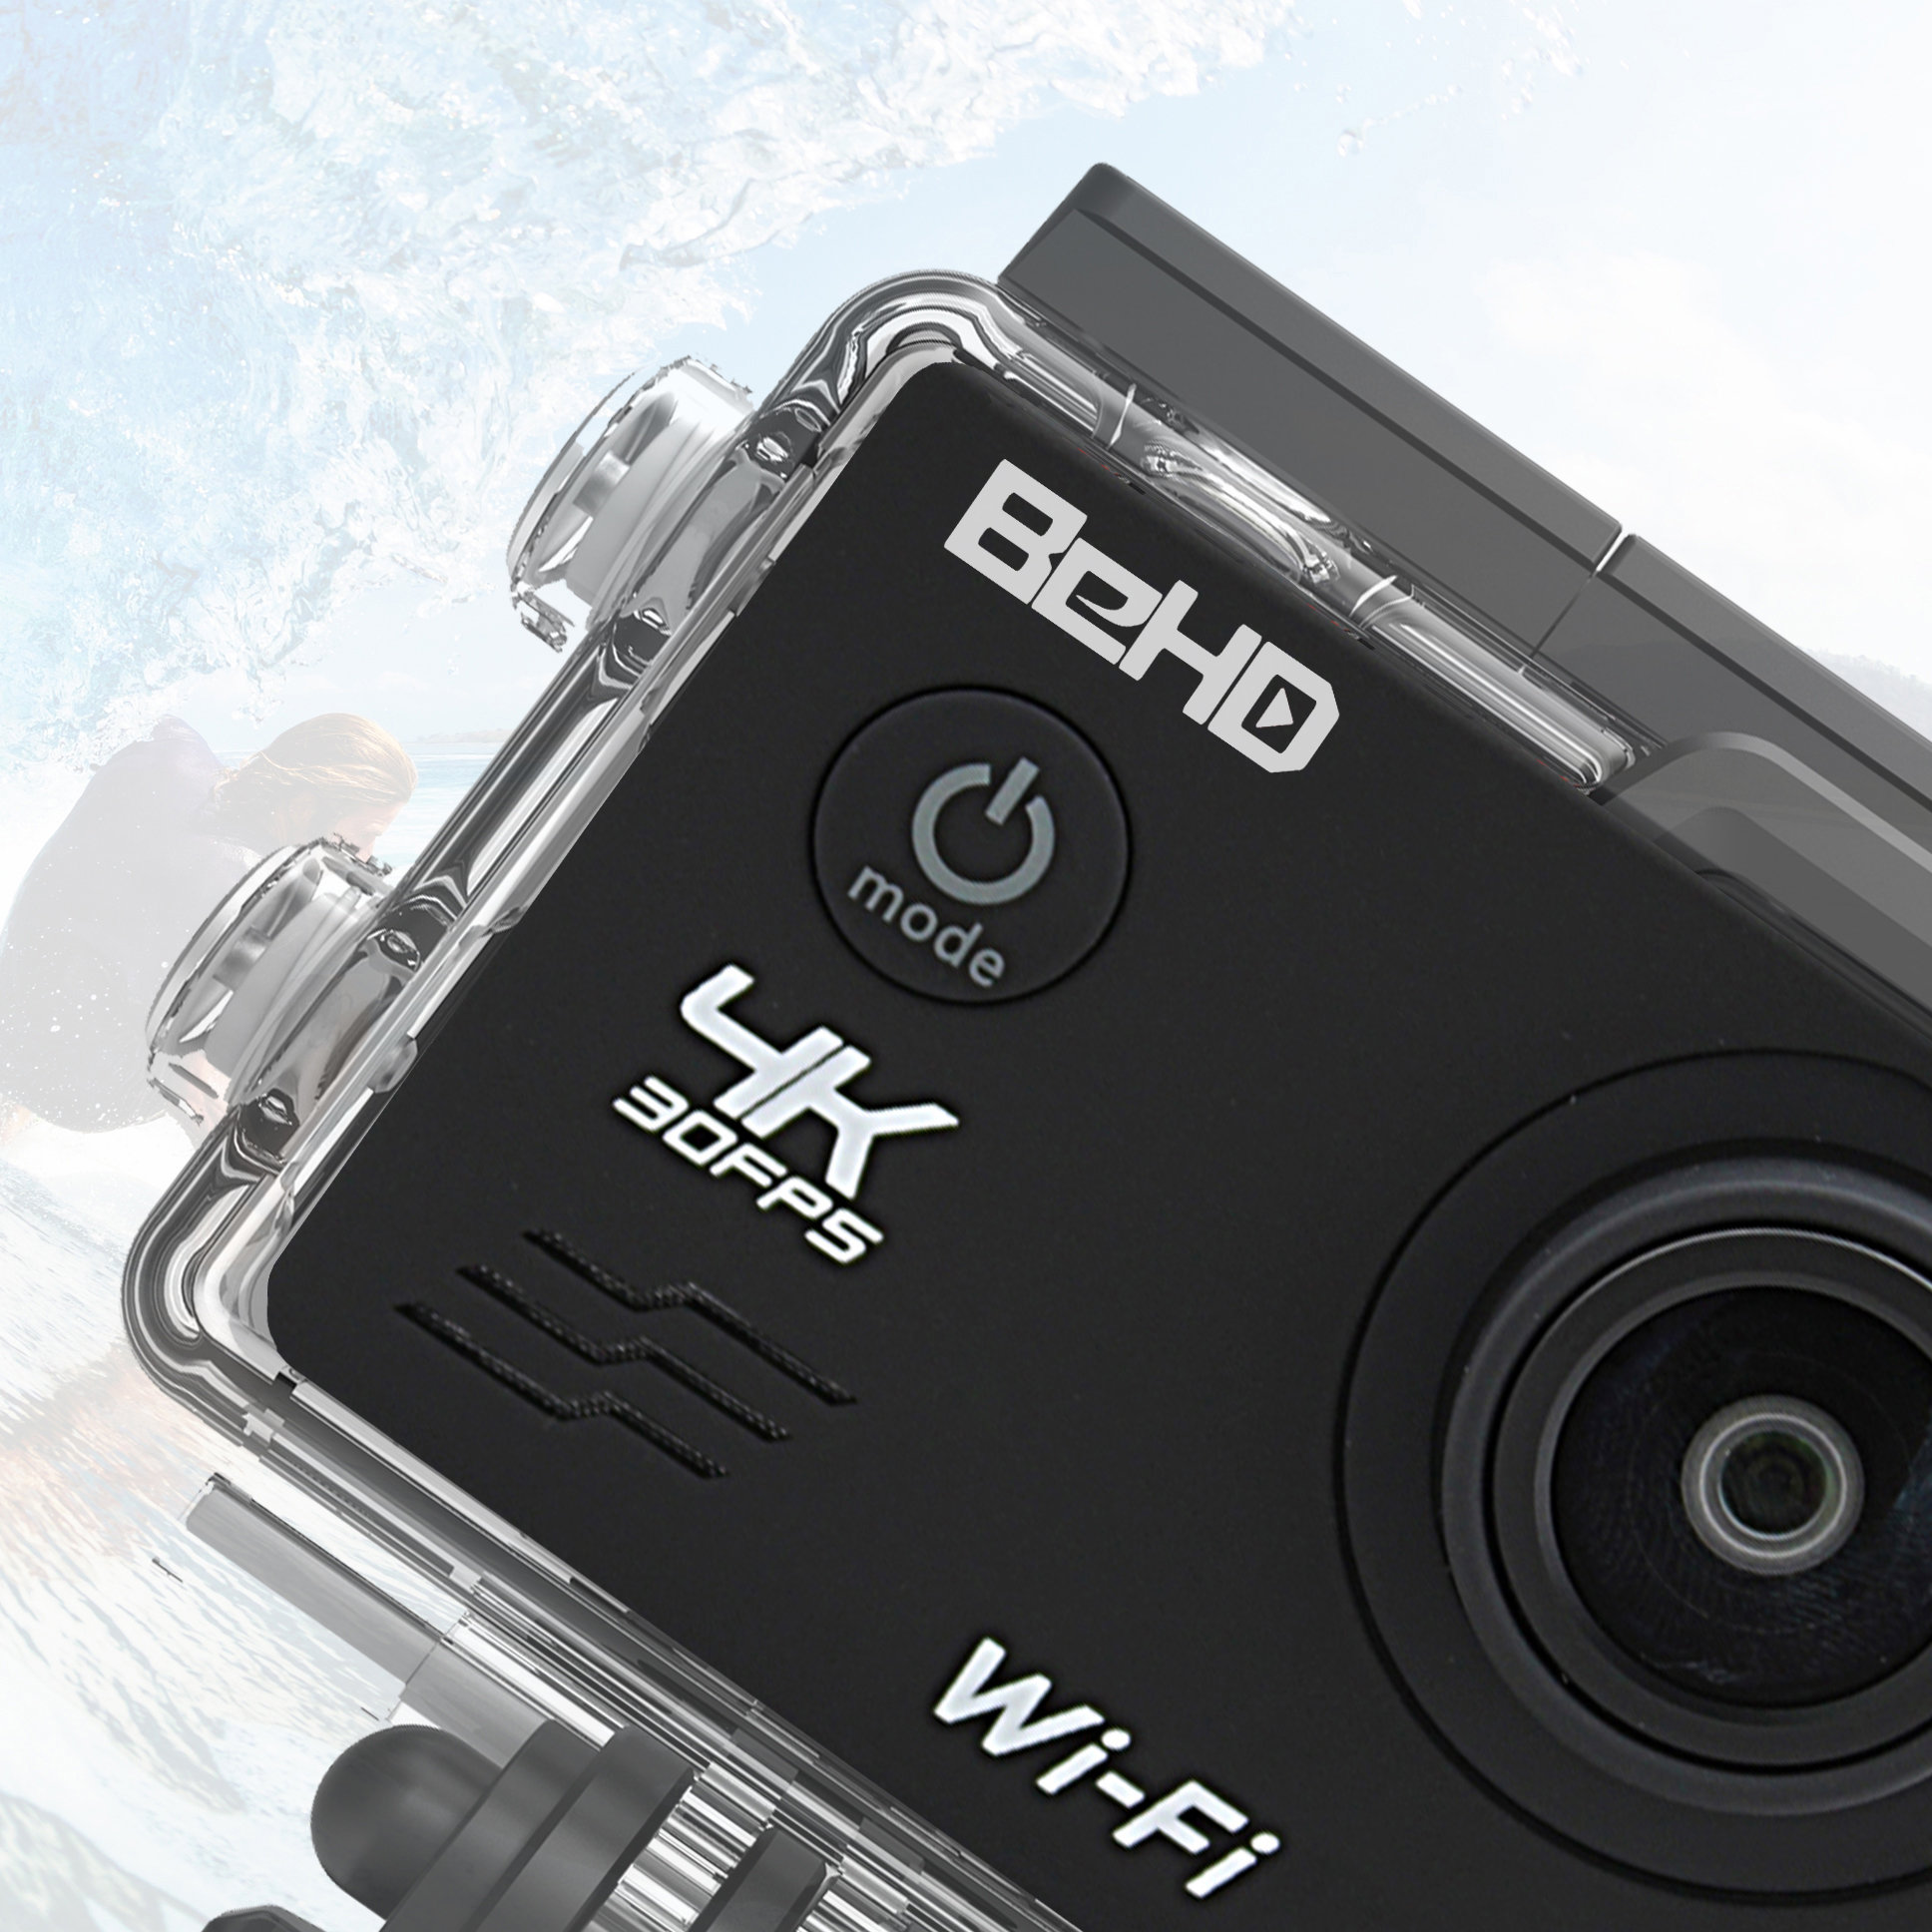 BeHD Virtue Kit (WiFi) | BeHD Camera